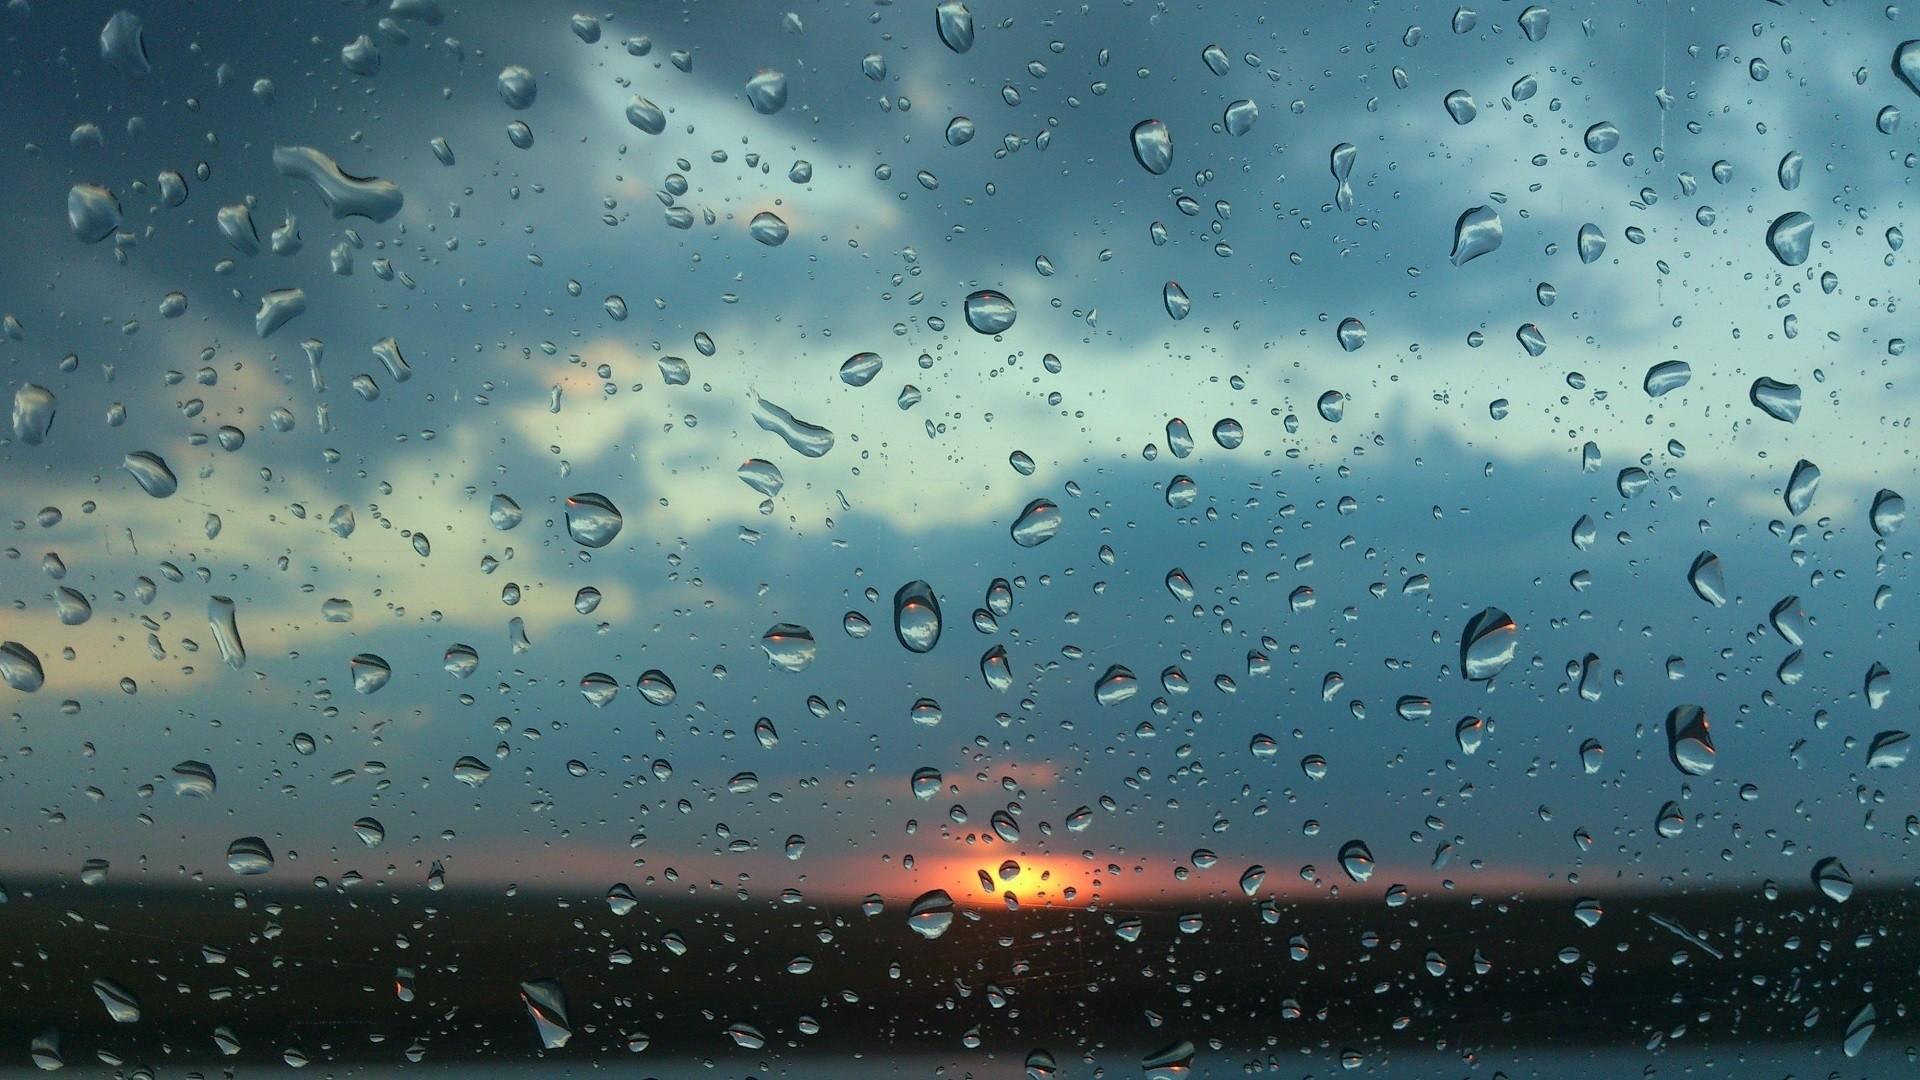 Rain hd desktop wallpaper